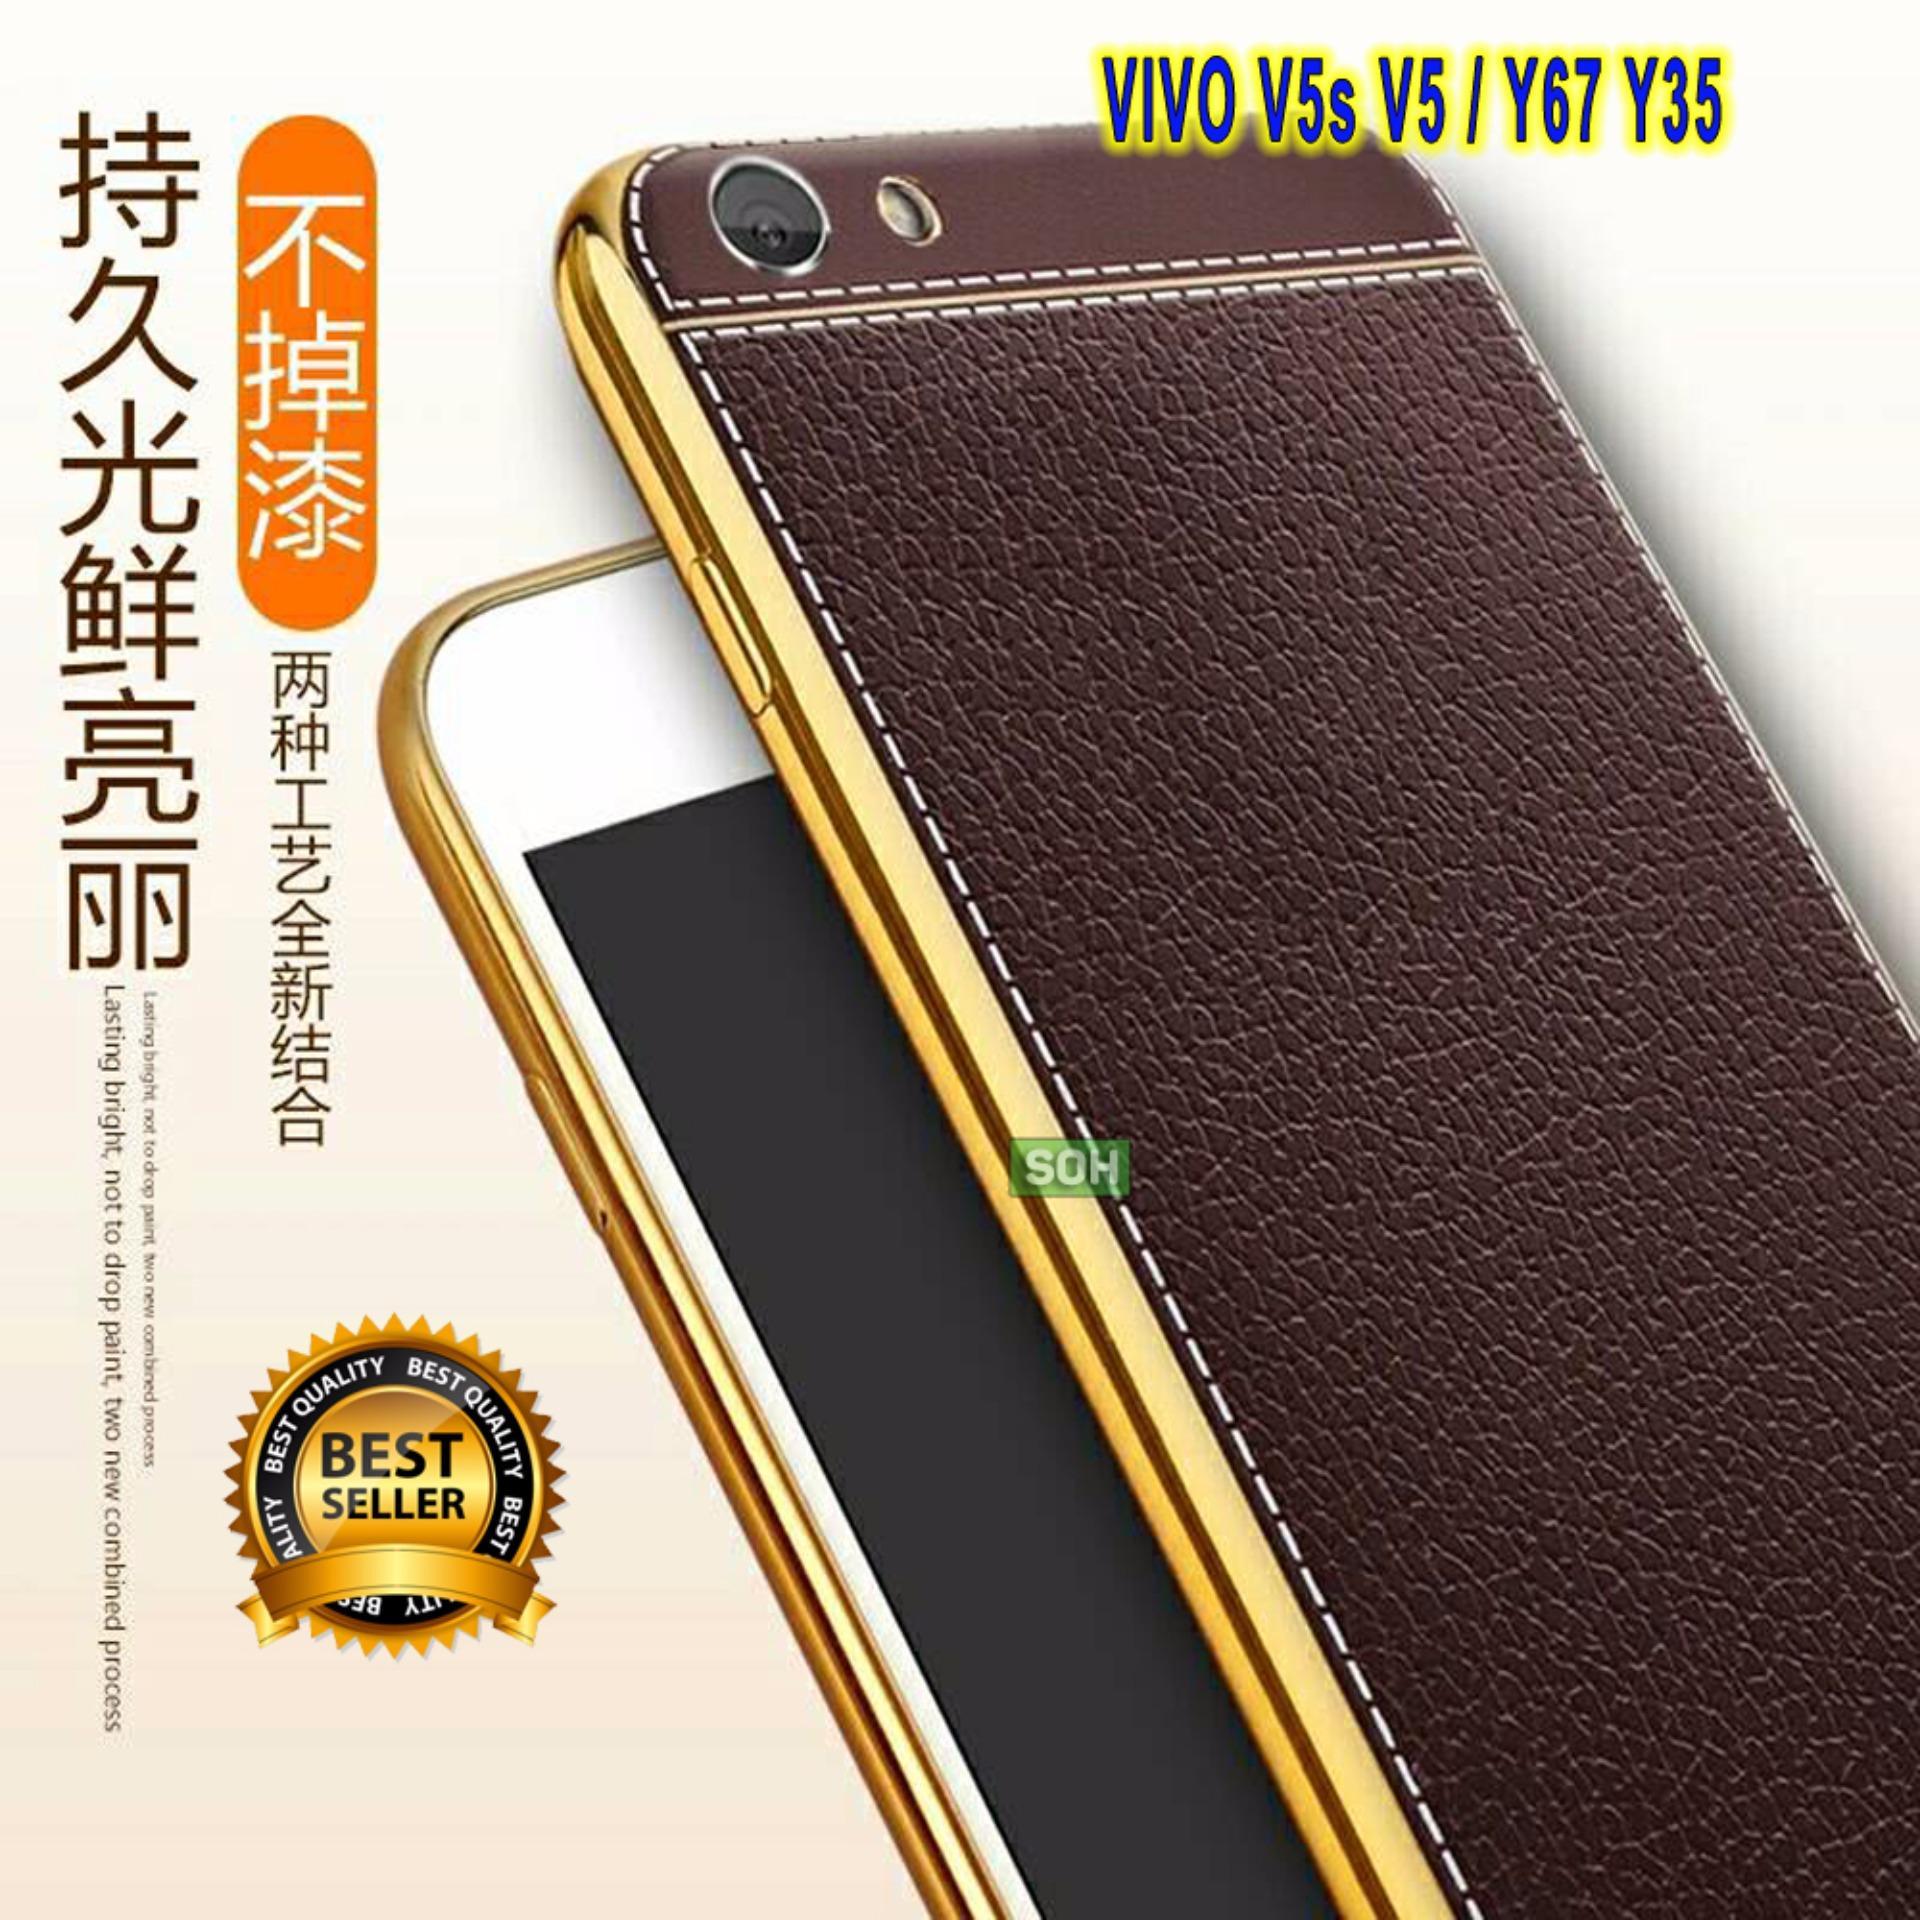 VIVO V5s V5 Y67 Y35 Soft Premium TPU Leather Back Cover CaseProtective Back .